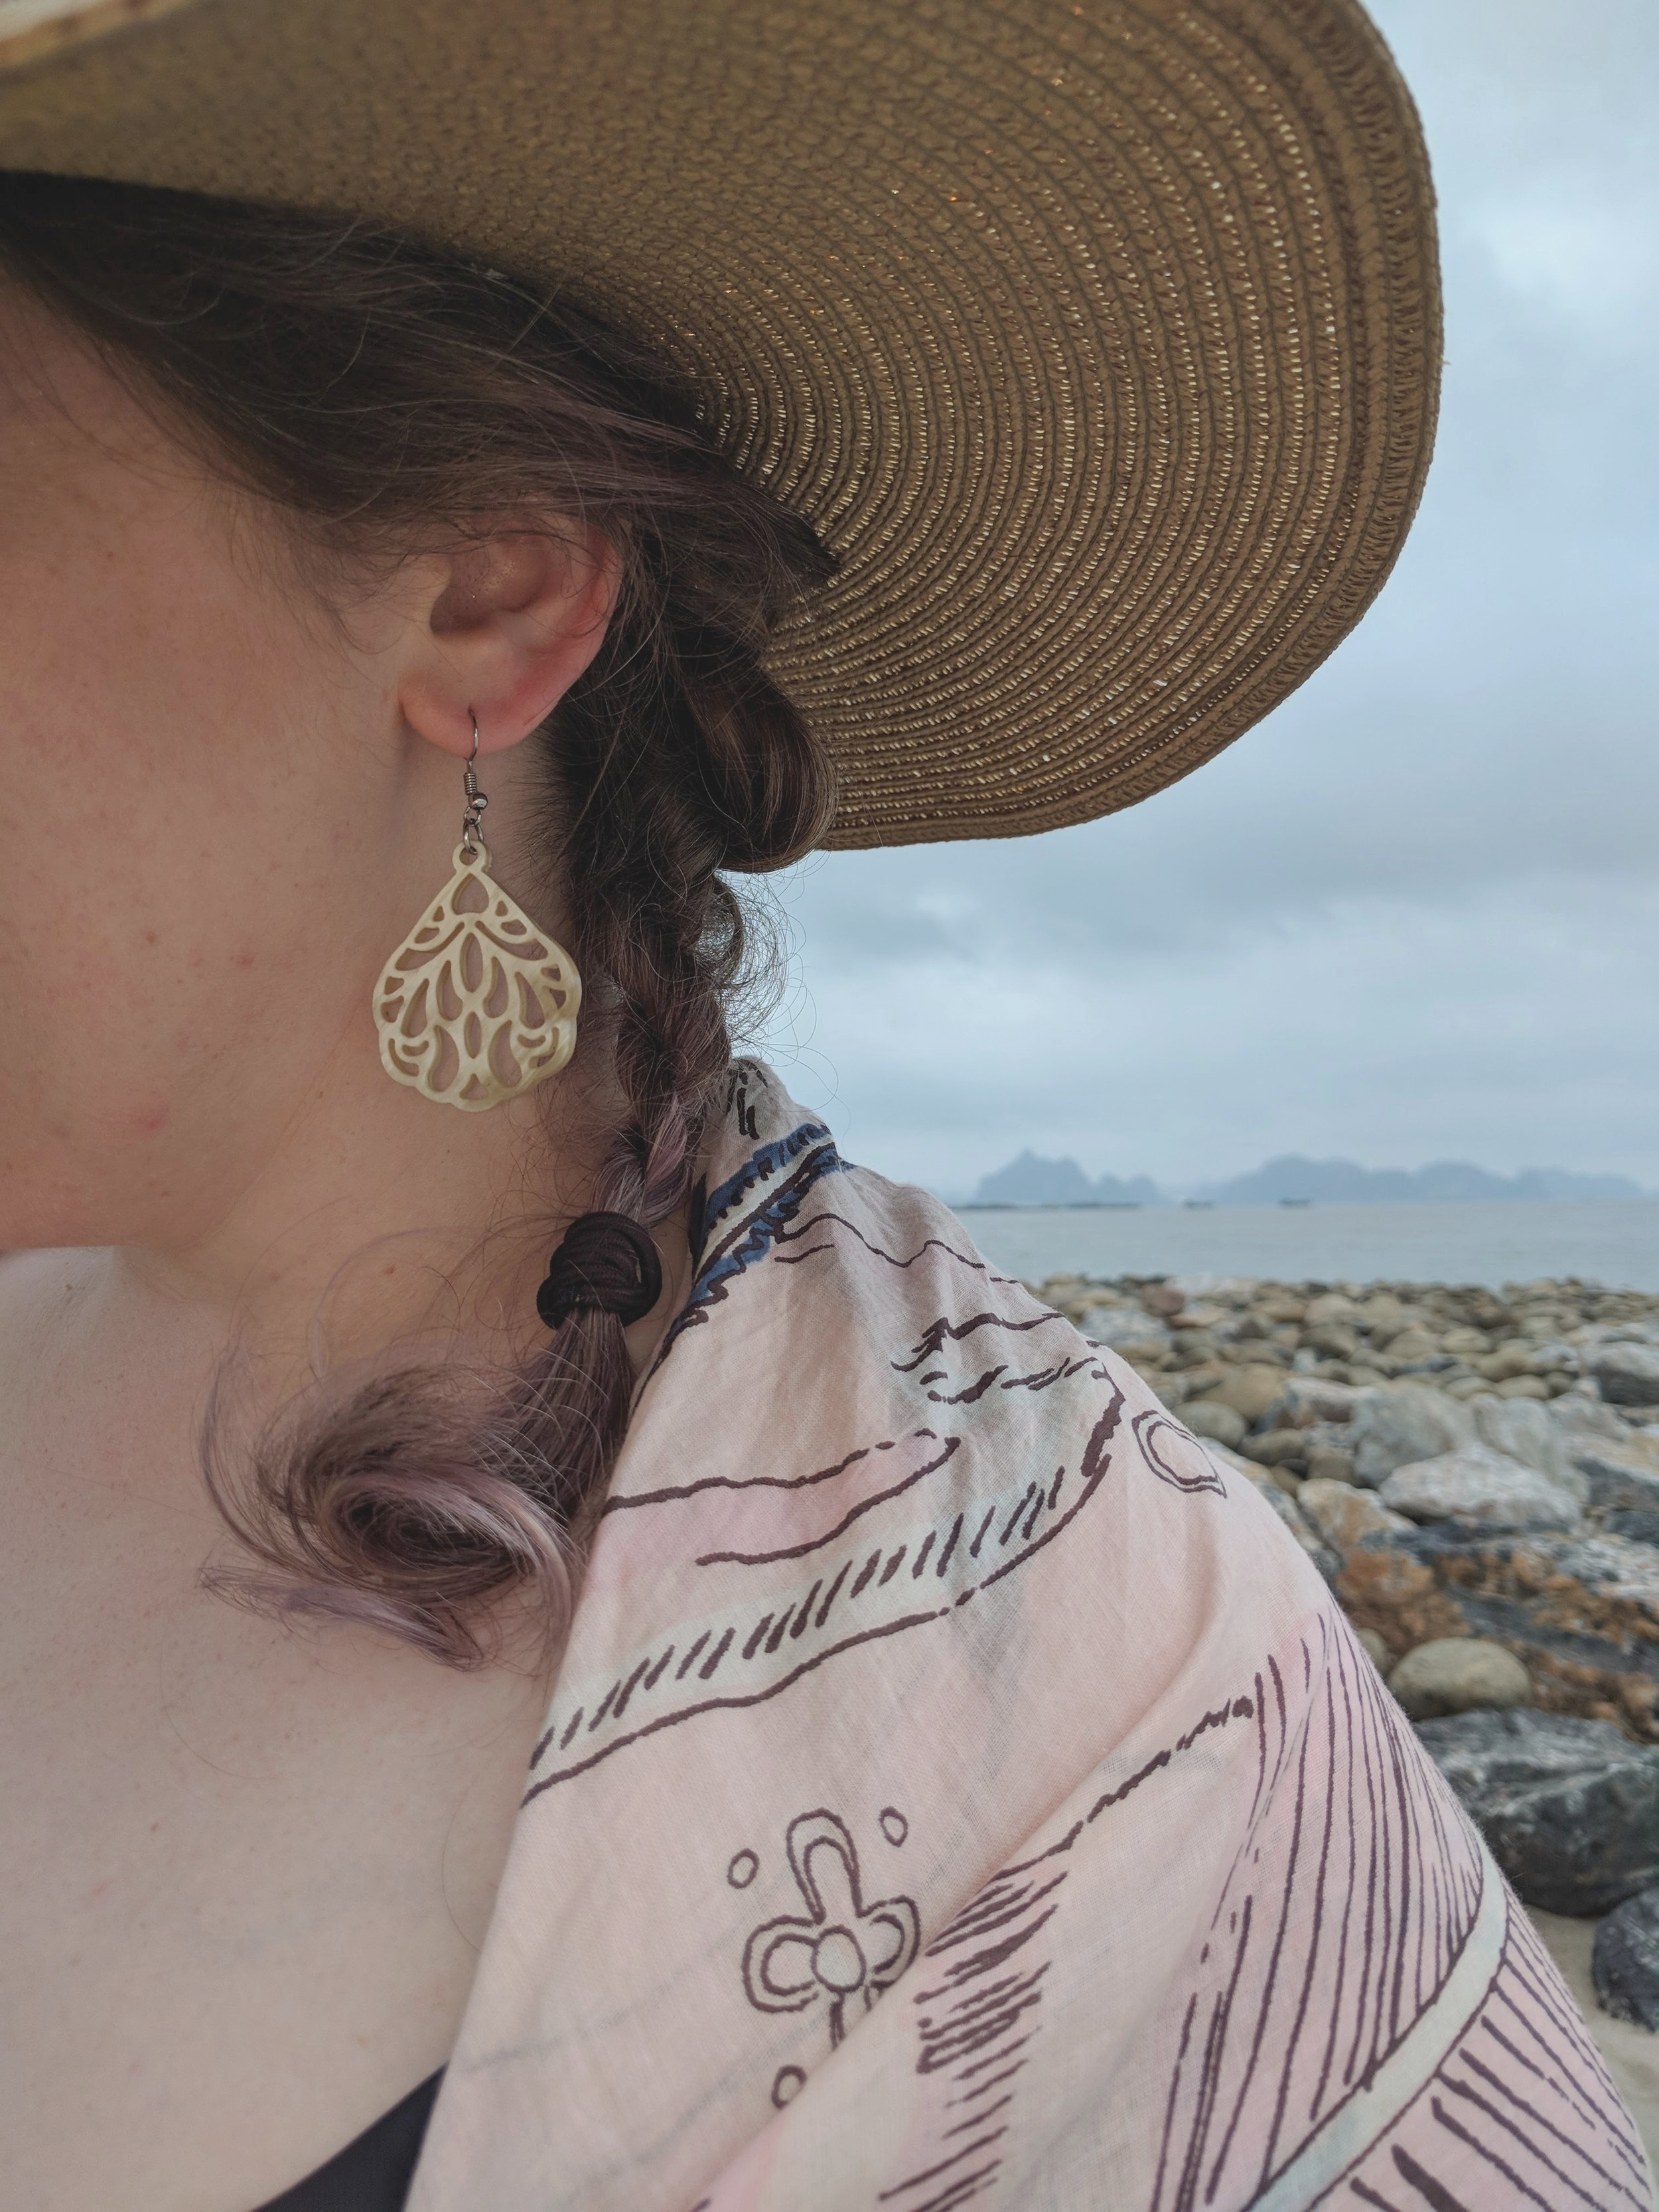 Calypso Earrings, Songbird Scarf, massive hat, swimsuit, breathtaking views of Ha Long Bay.